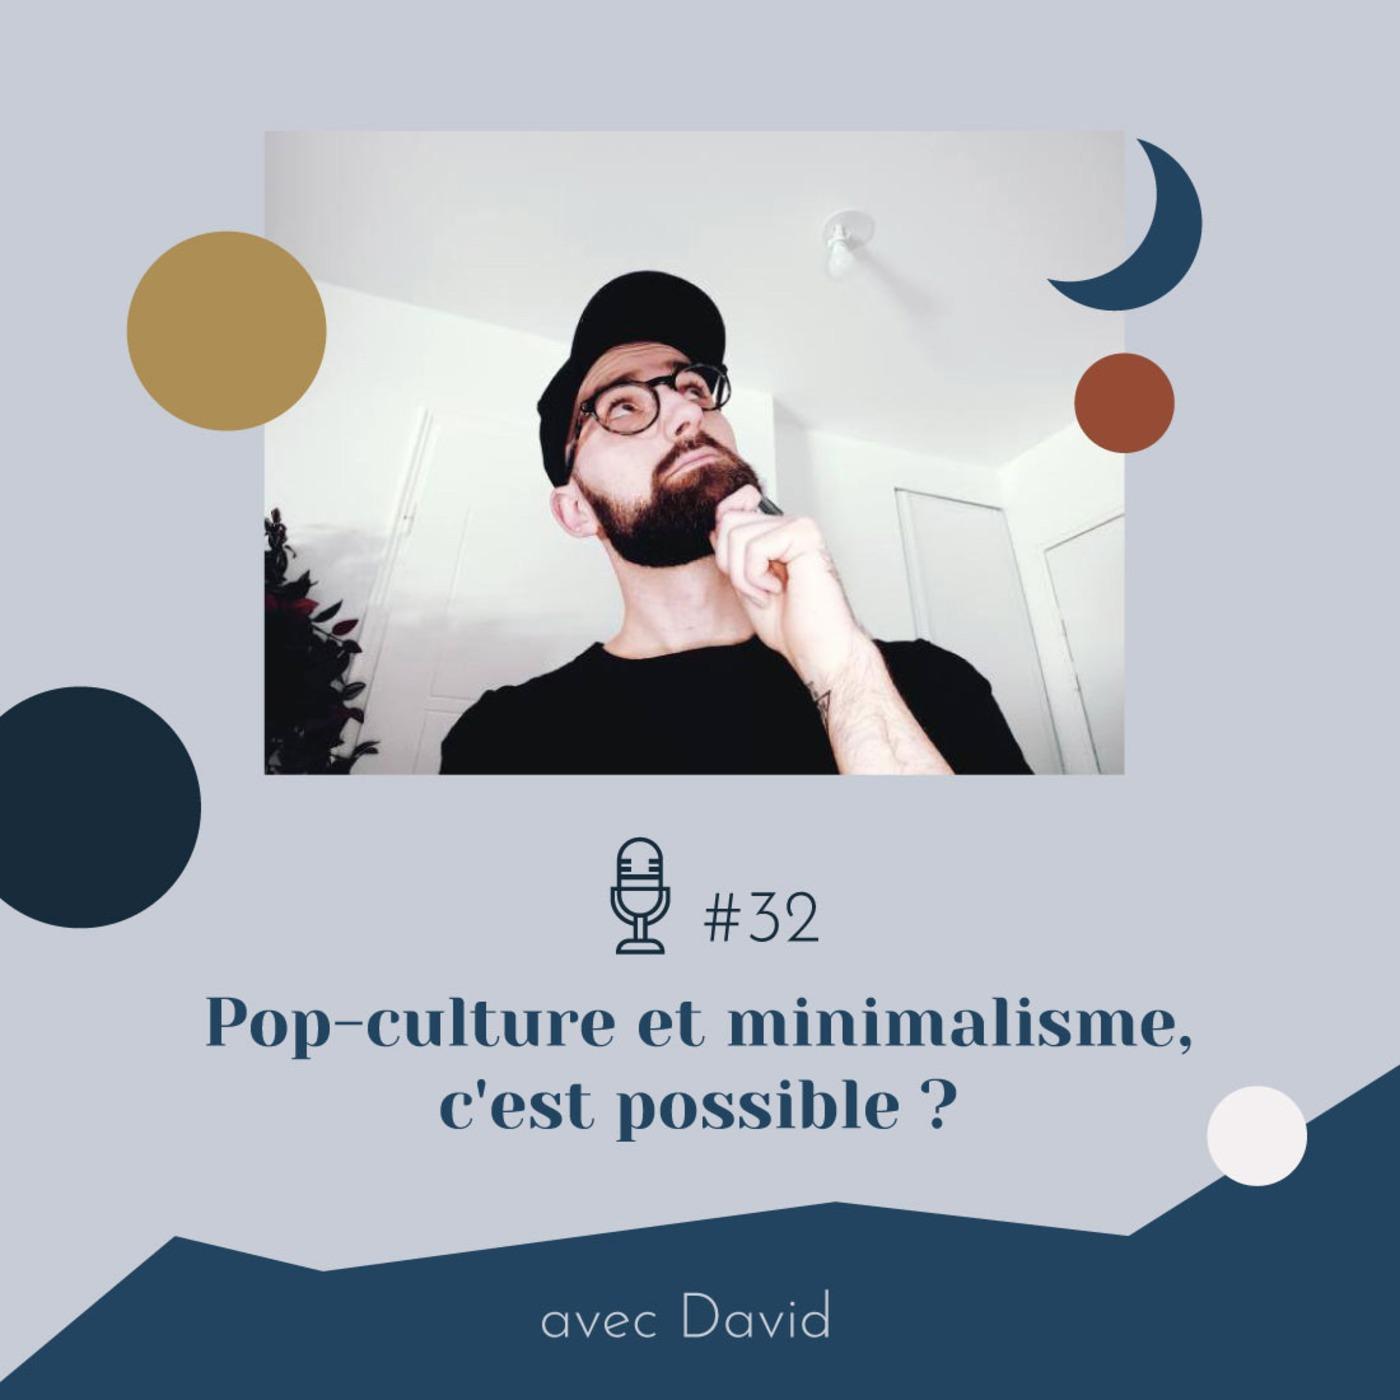 #32 | Pop-culture et minimalisme, c'est possible ? - avec David (legeekminimaliste)